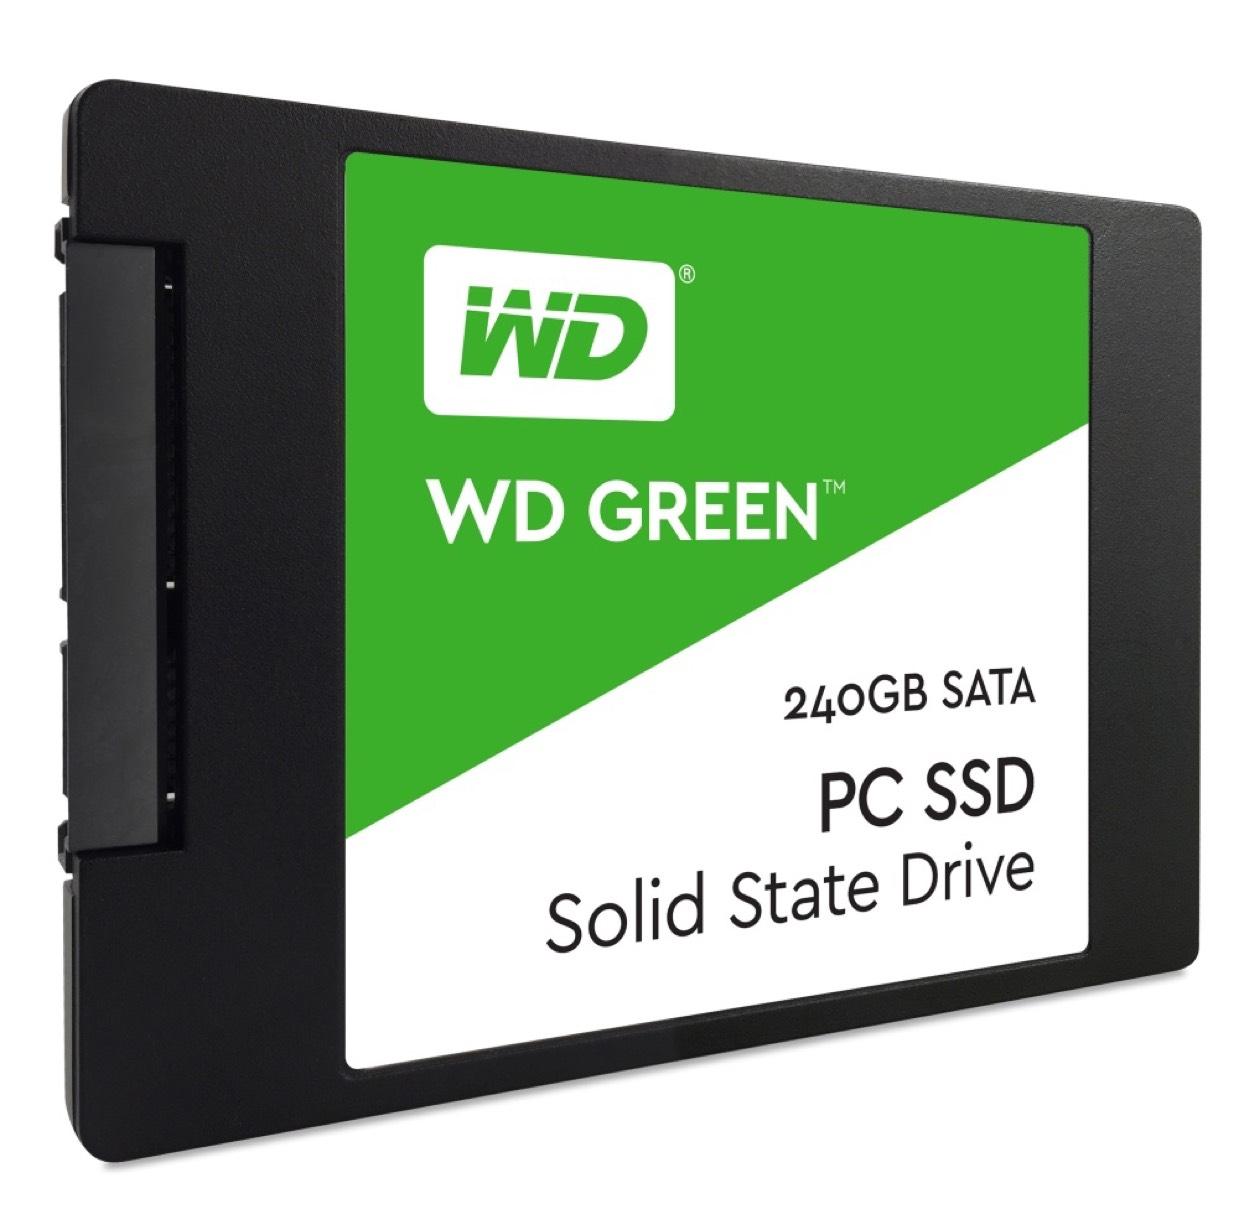 Cyberpuerta: SSD 240gb Western Digital